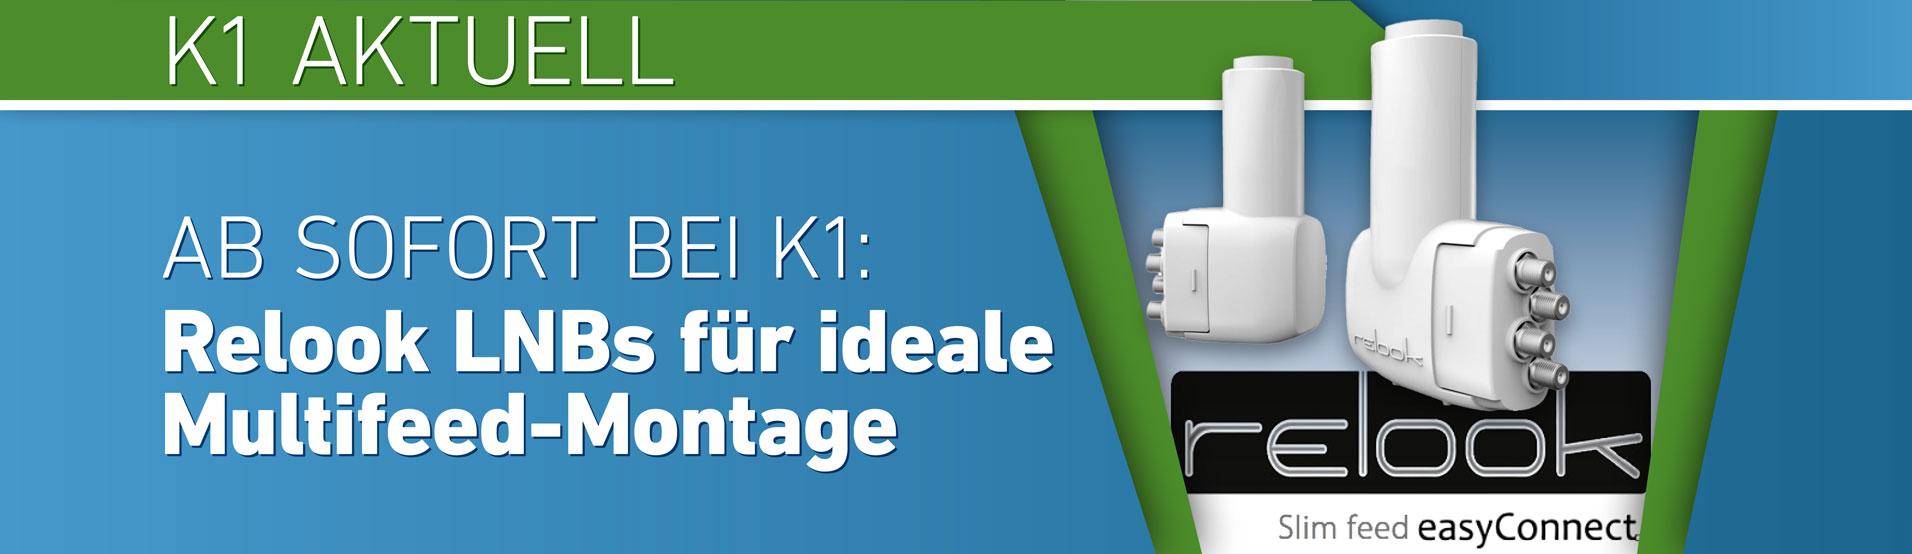 K1 Aktuell – Relook LNBs für ideale Multifeed-Montage